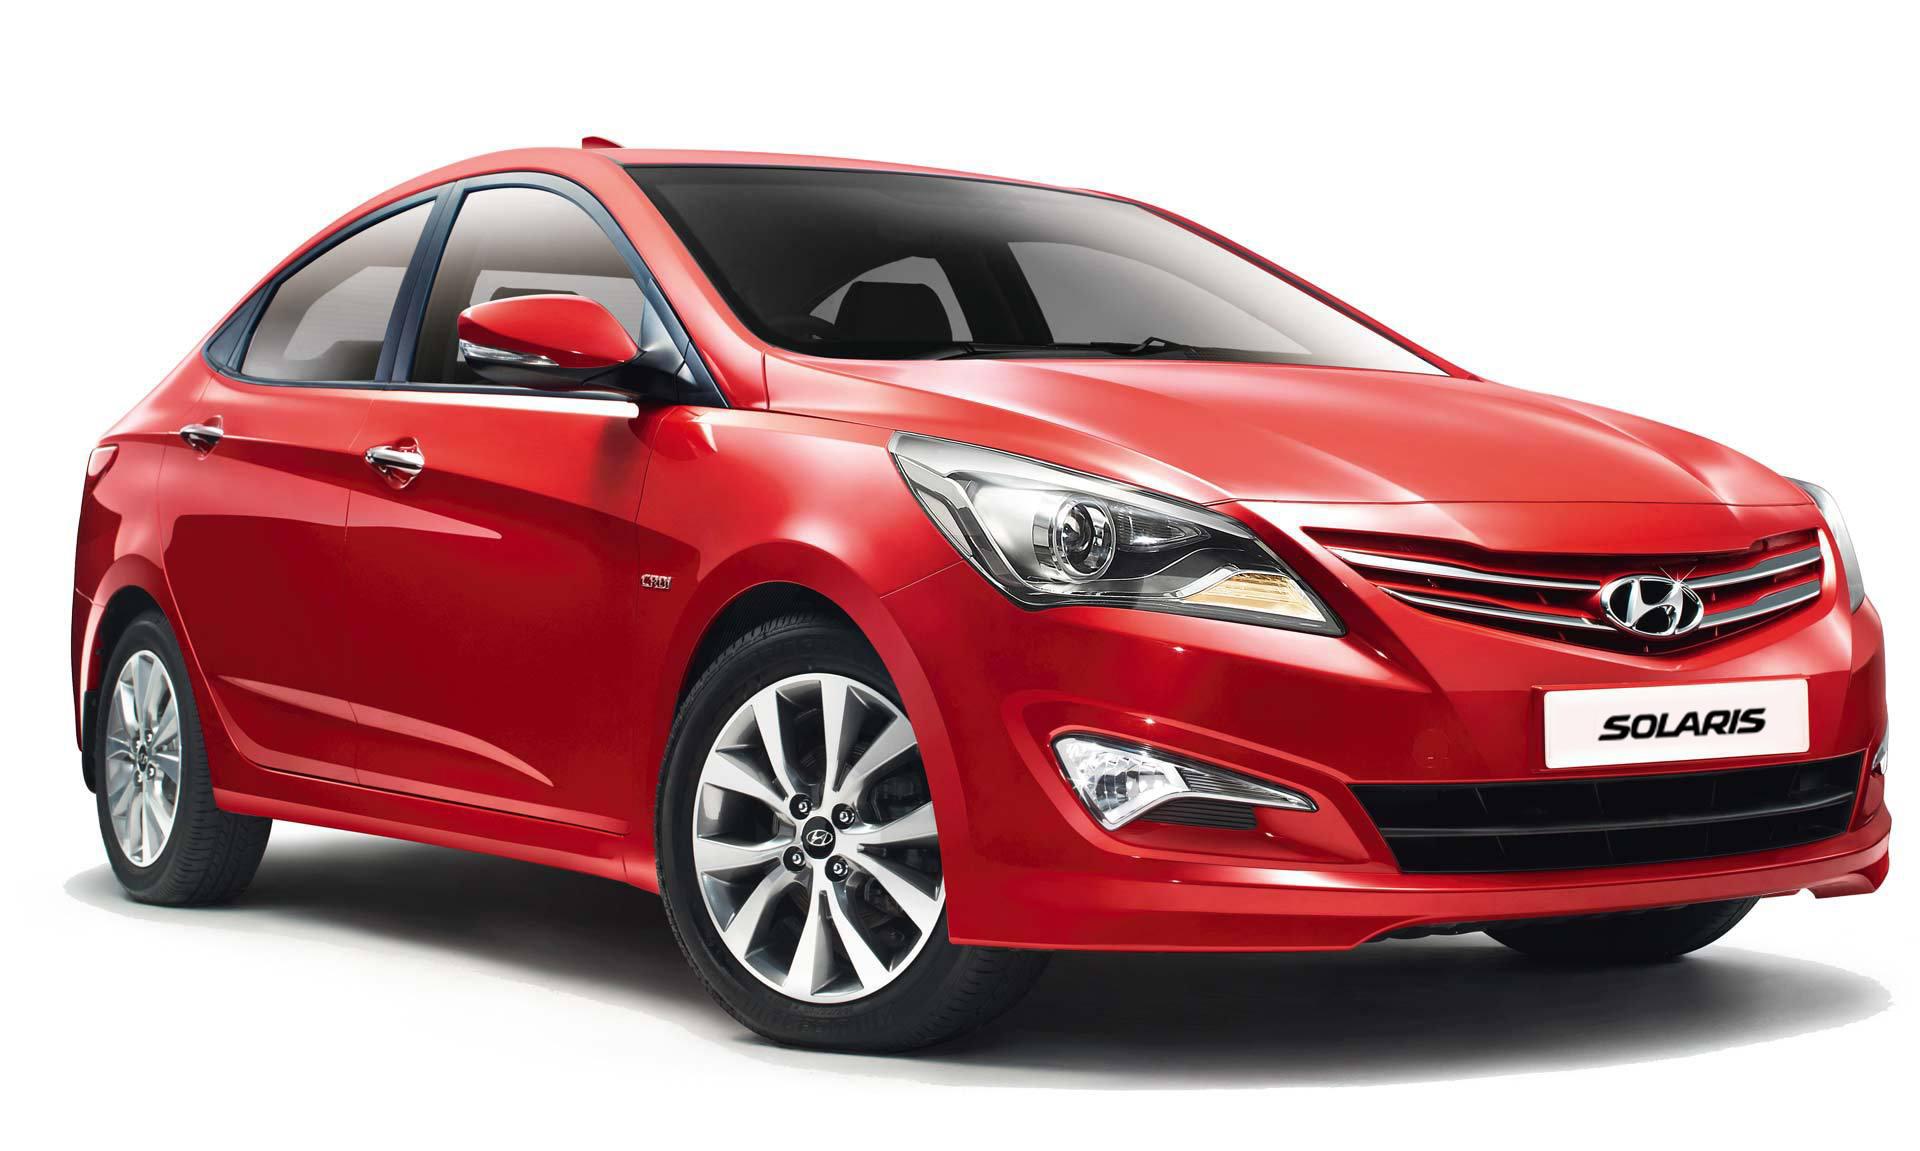 Hyundai Solaris 2018 GL In Egypt: New Car Prices, Specs